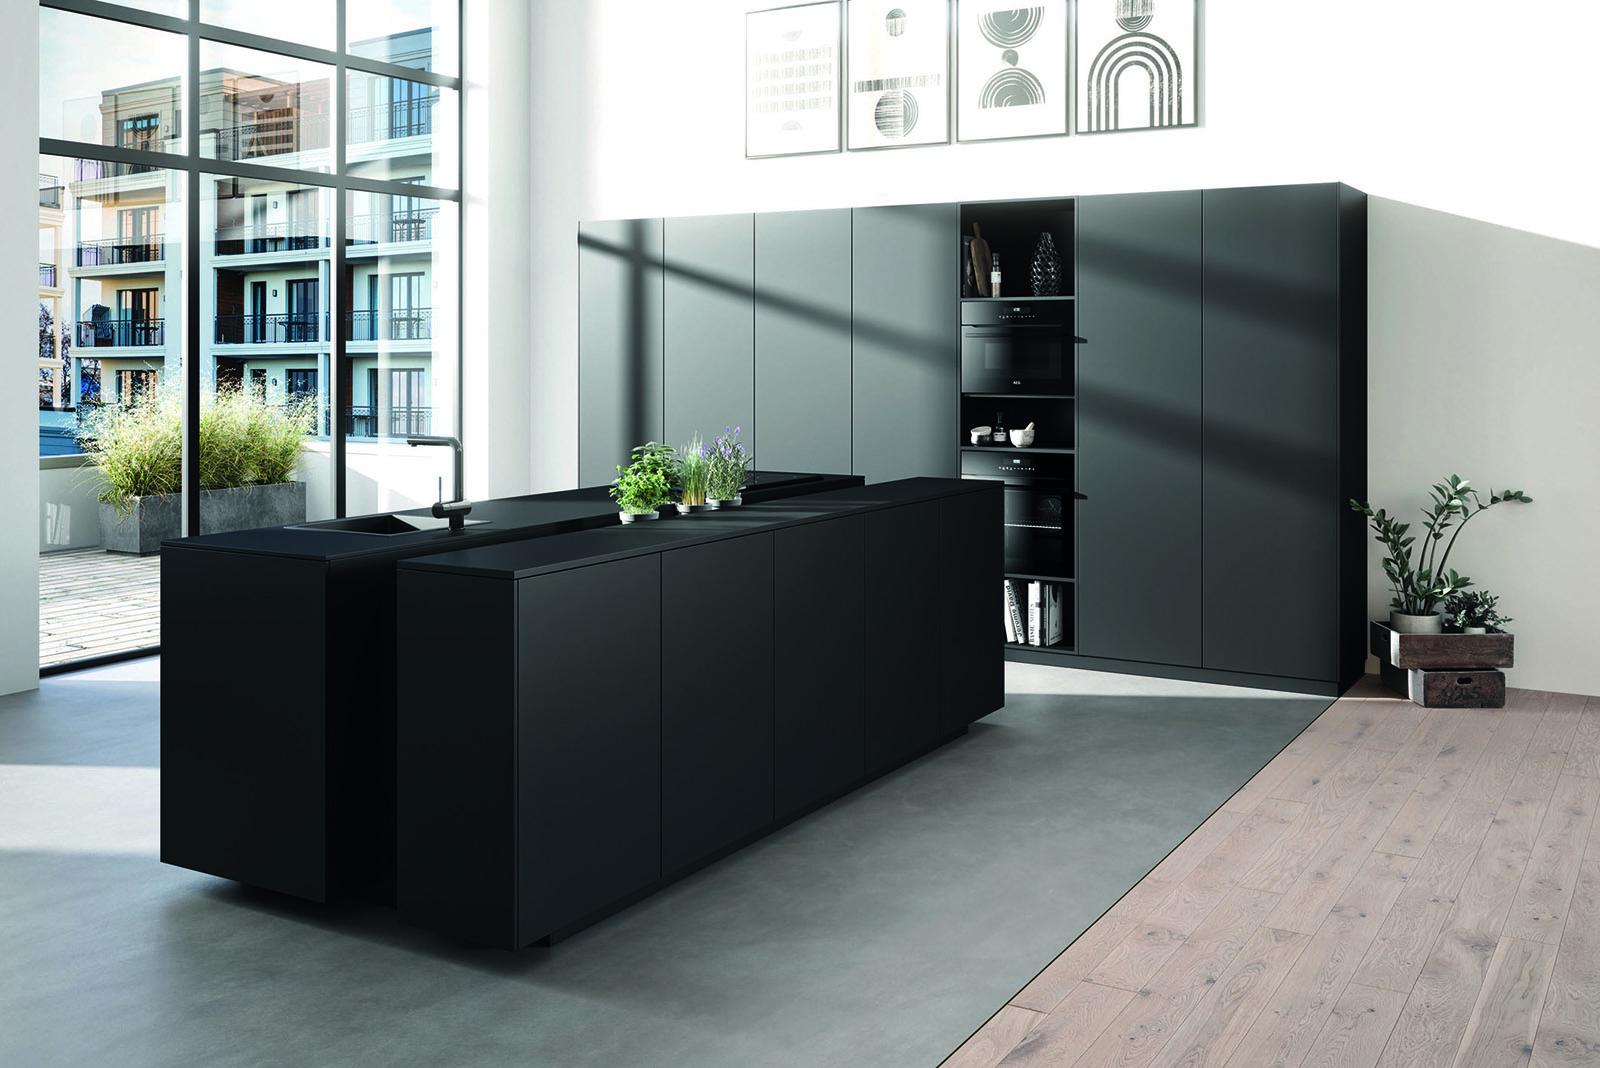 Rotpunkt | Core brushed metal kitchen